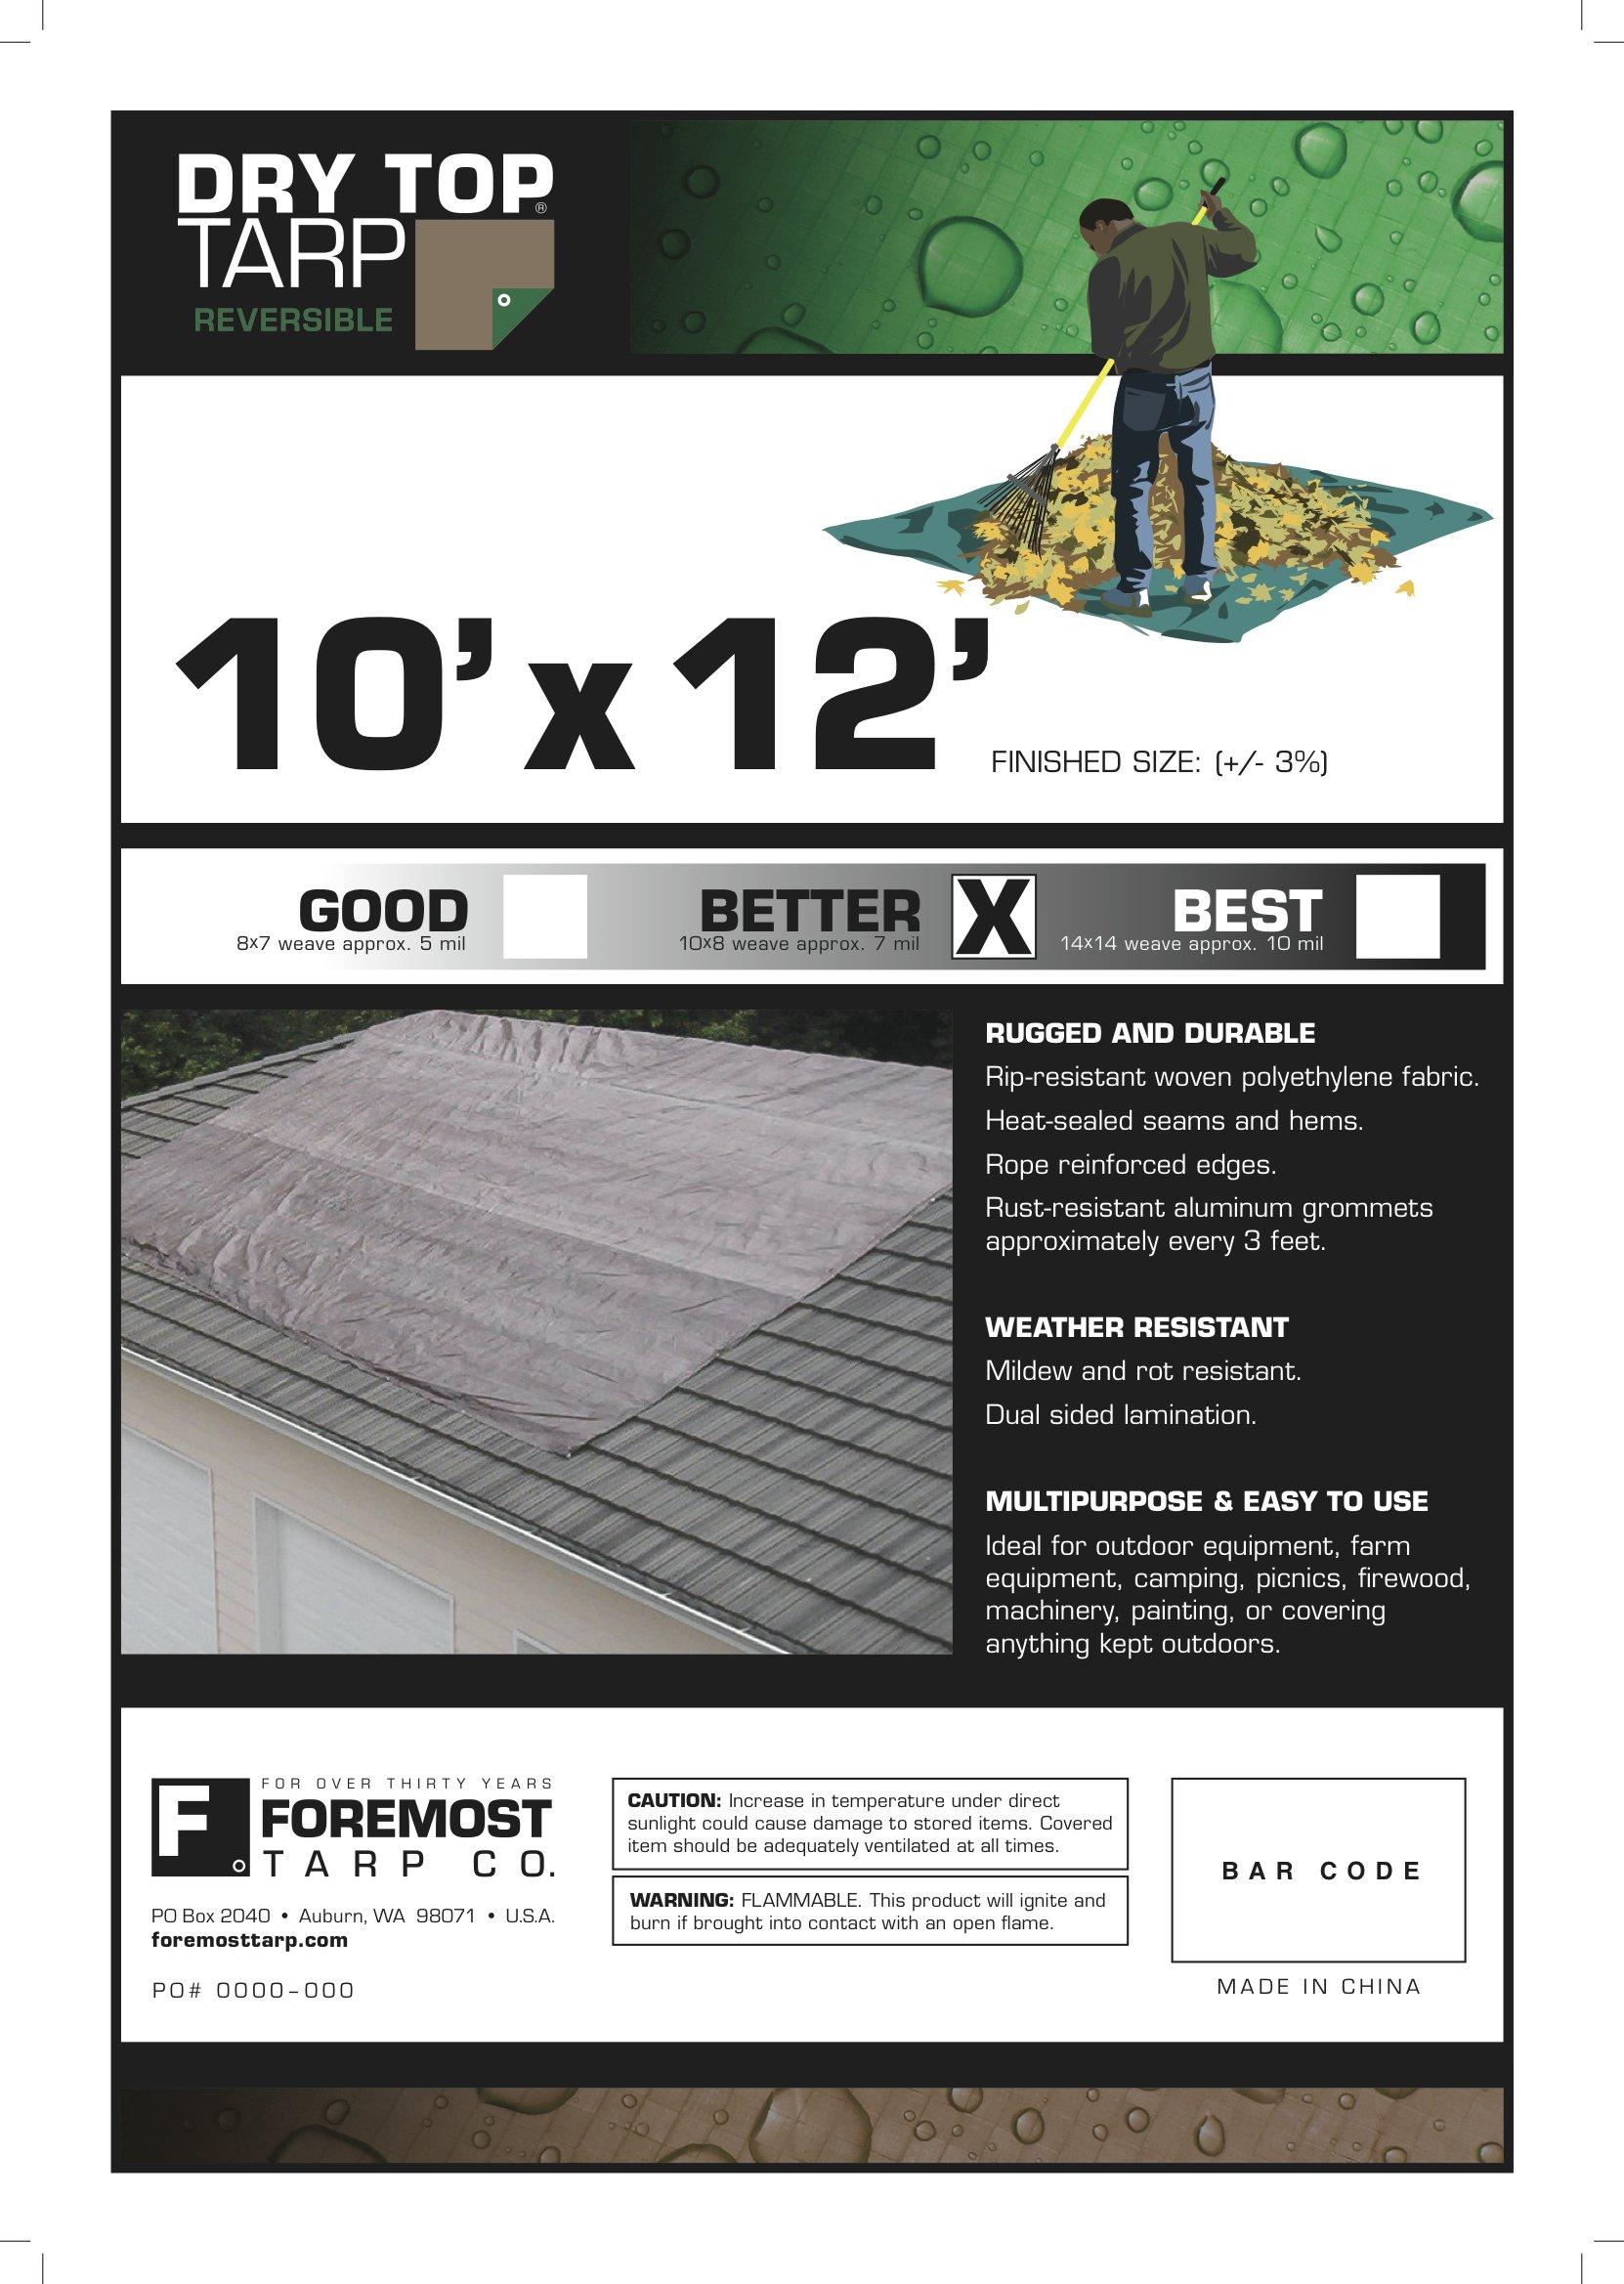 10x12 Multi-Purpose Brown/Green Medium Duty DRY TOP Poly Tarp (10'x12') by DRY TOP